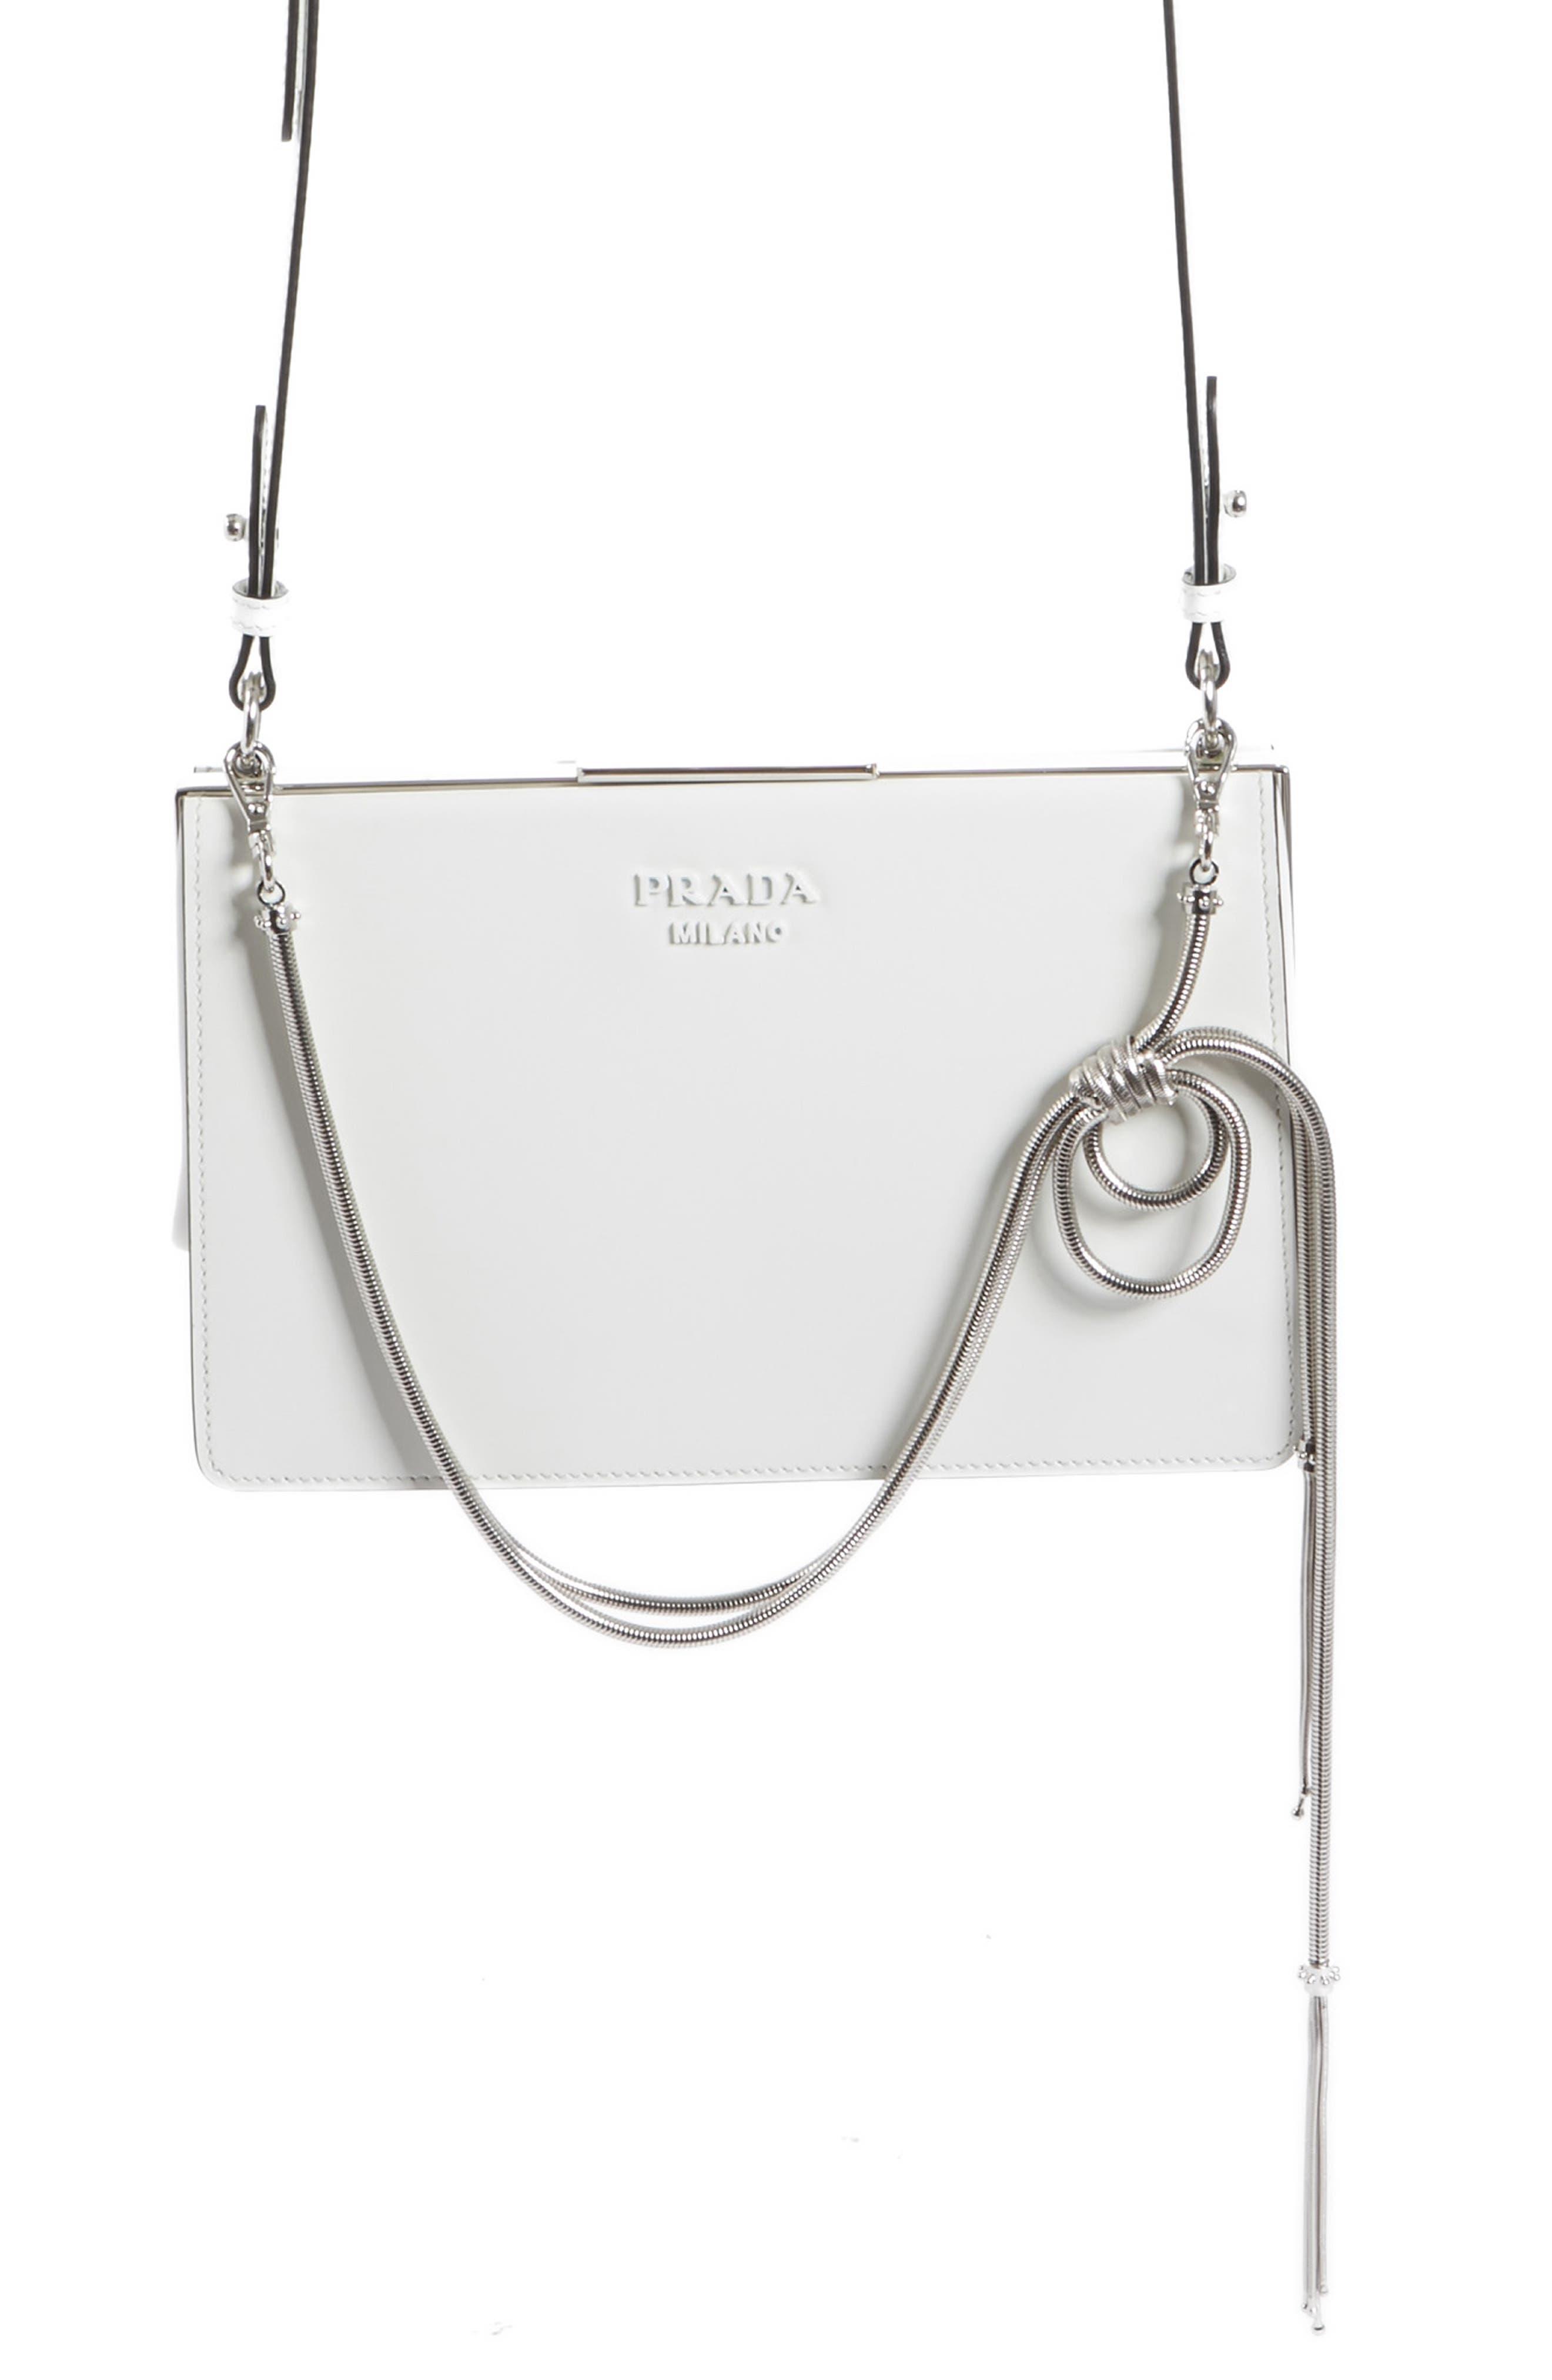 Prada Spazzolato Calfskin Crossbody Bag